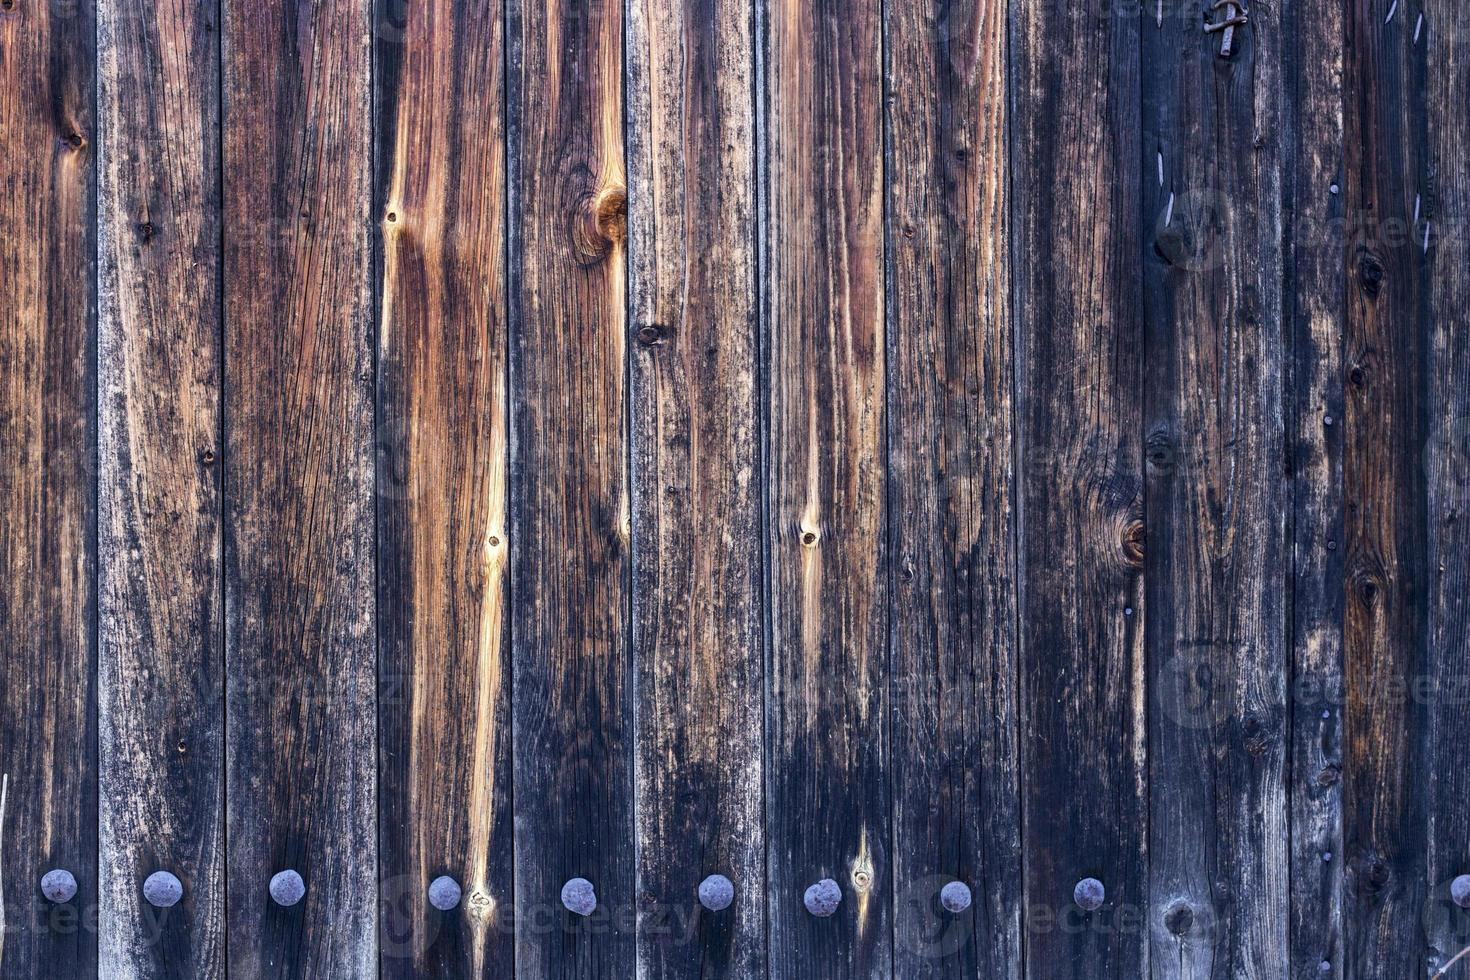 viejo fondo colorido de madera foto